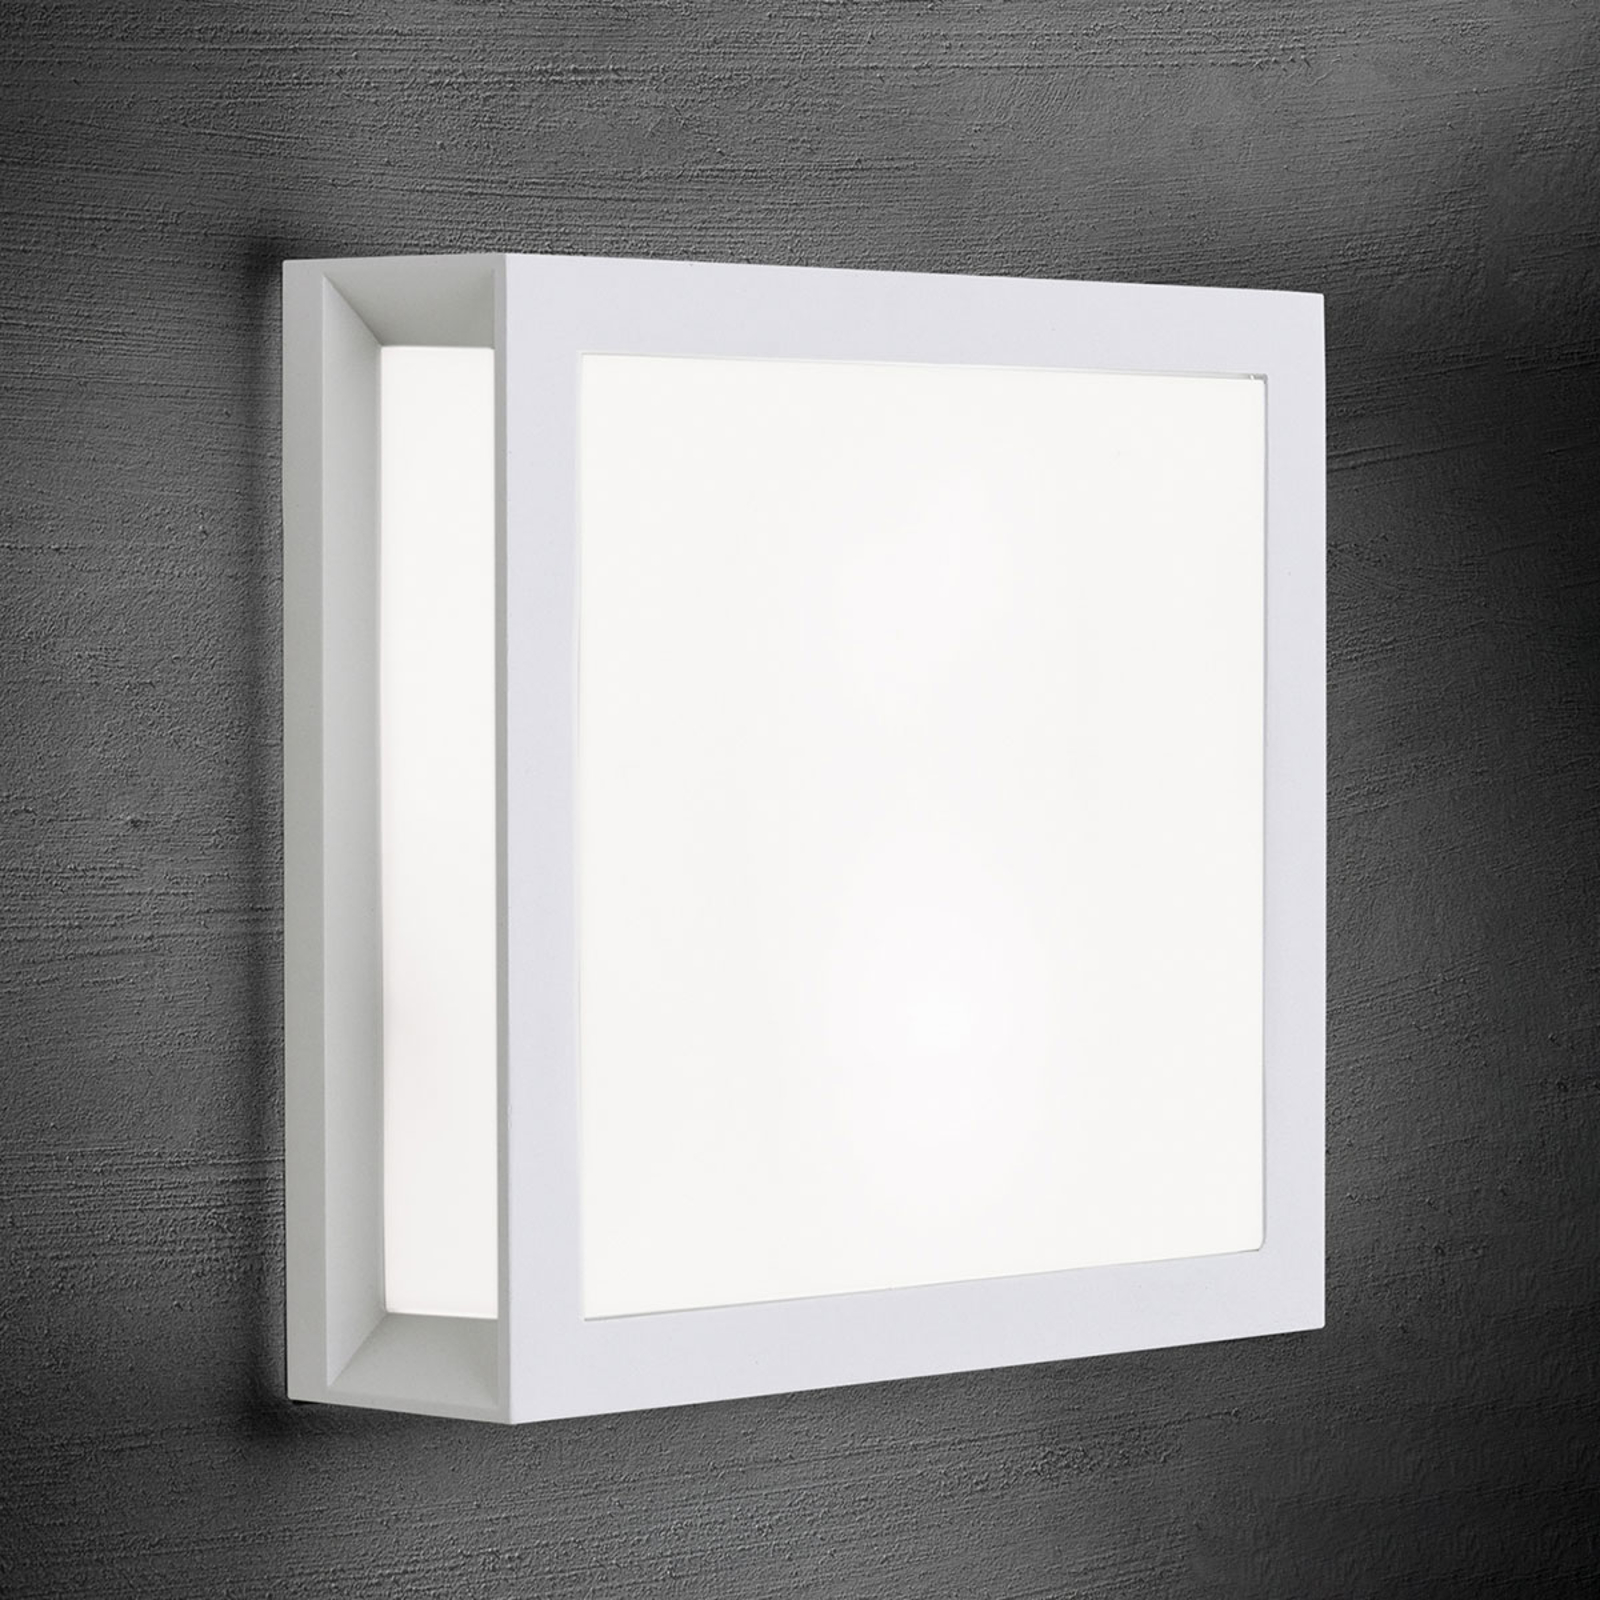 Henry - hoekige buitenwandlamp in wit